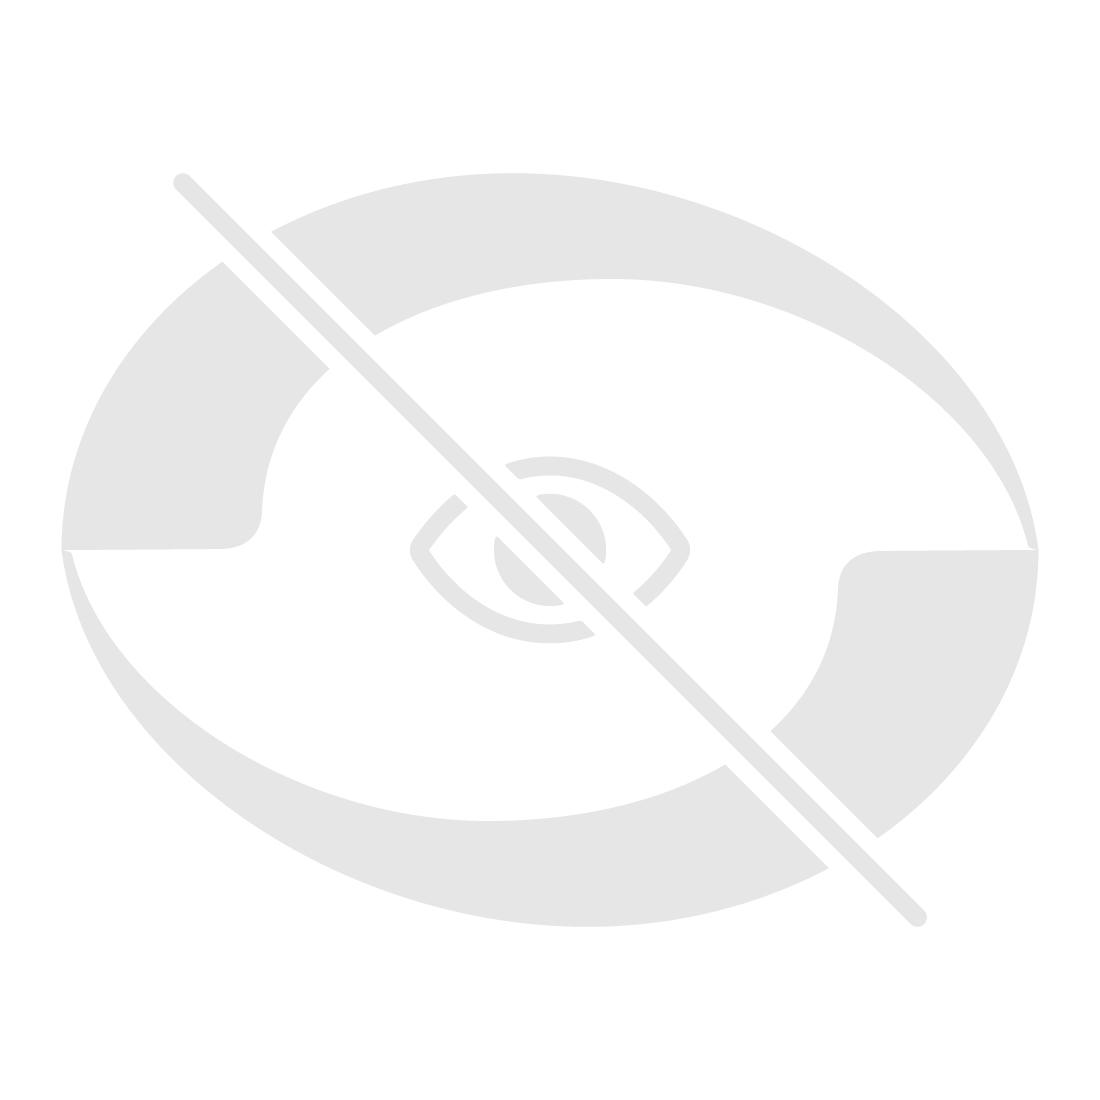 GeoVision GV-650B-16 • 16 channel hybrid video capture card